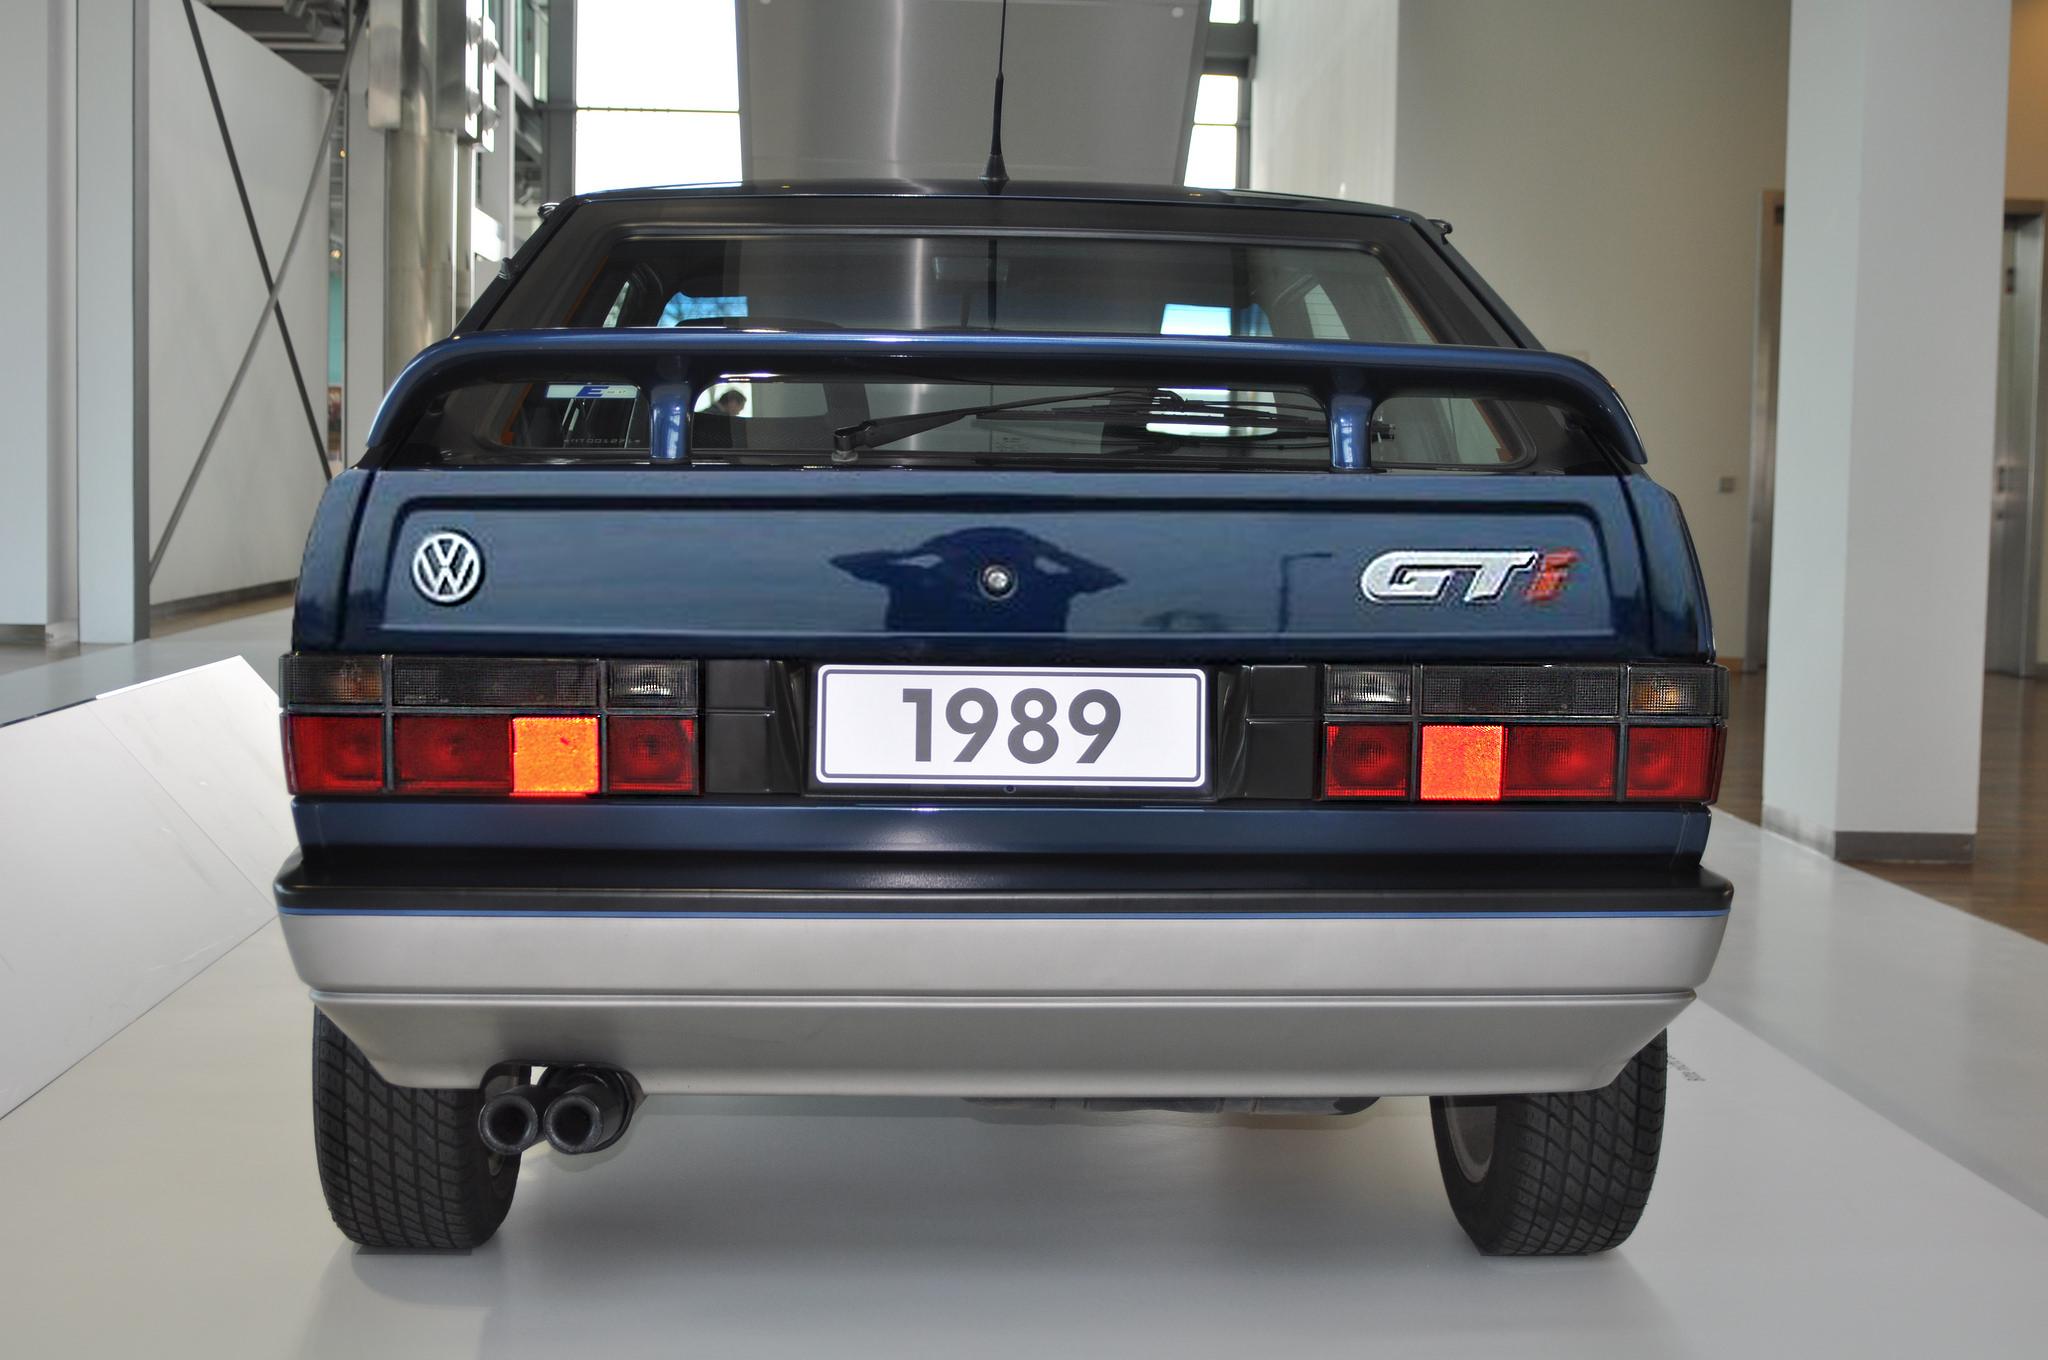 Gol GTI 2.0 1989